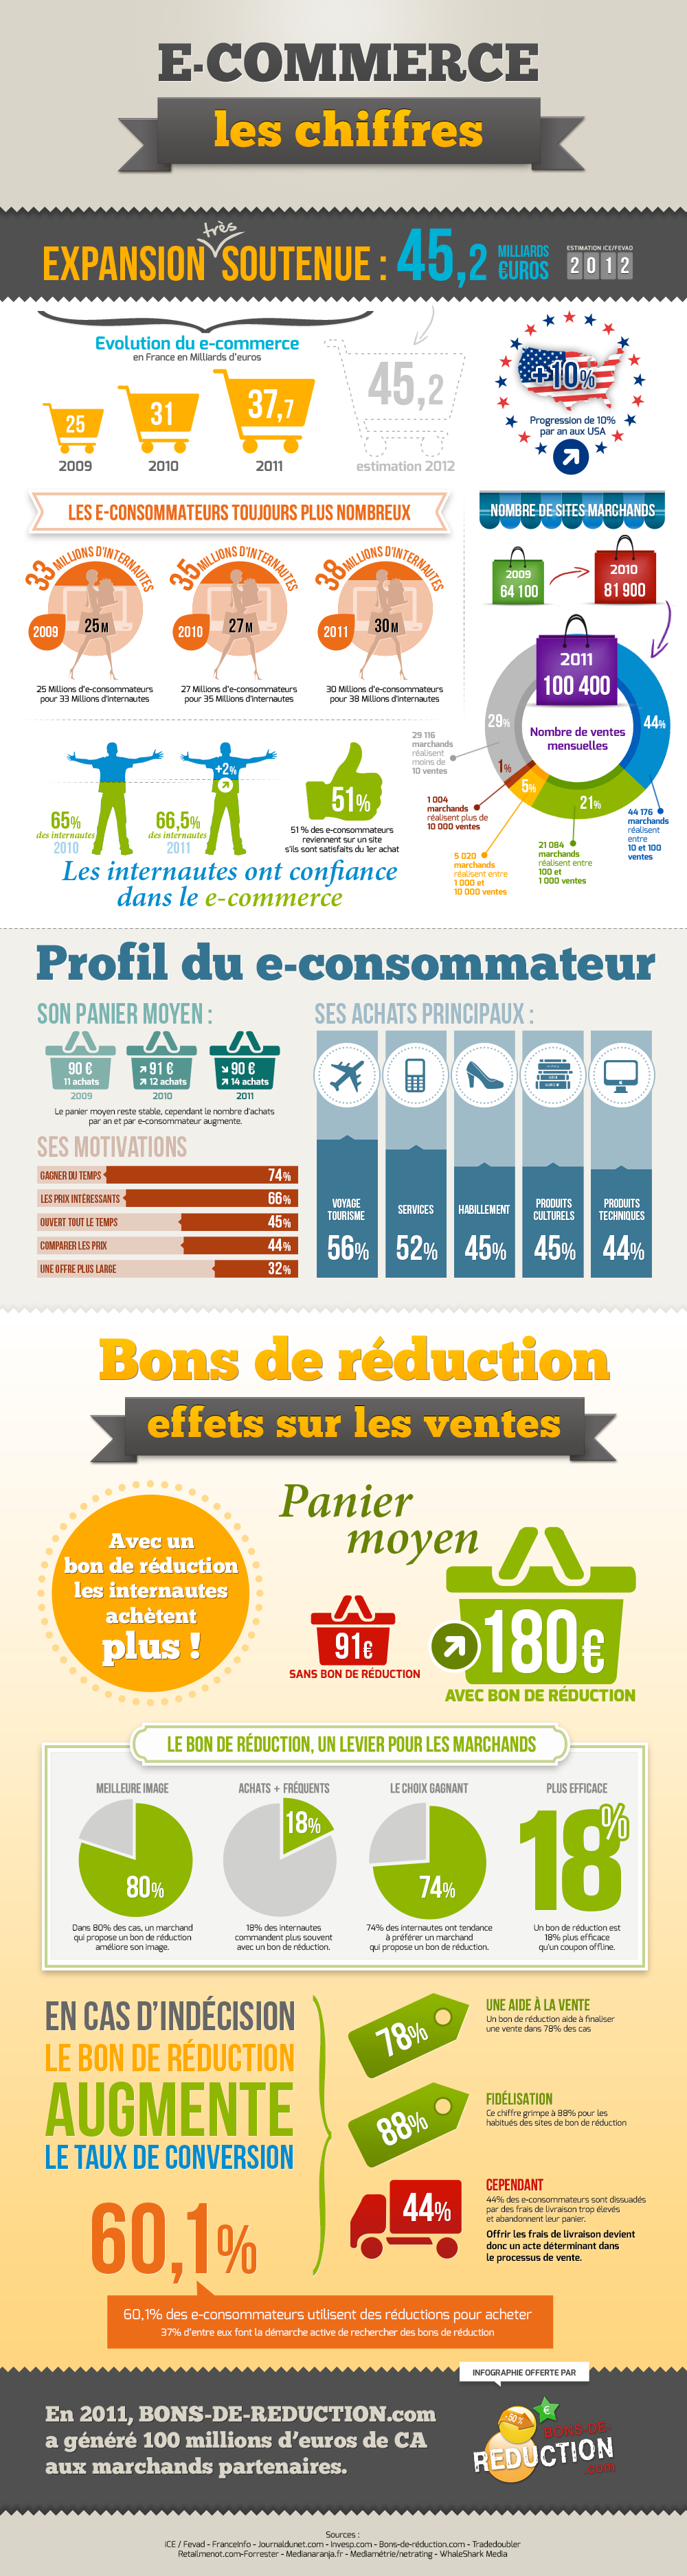 chiffres-ecommerce-2012